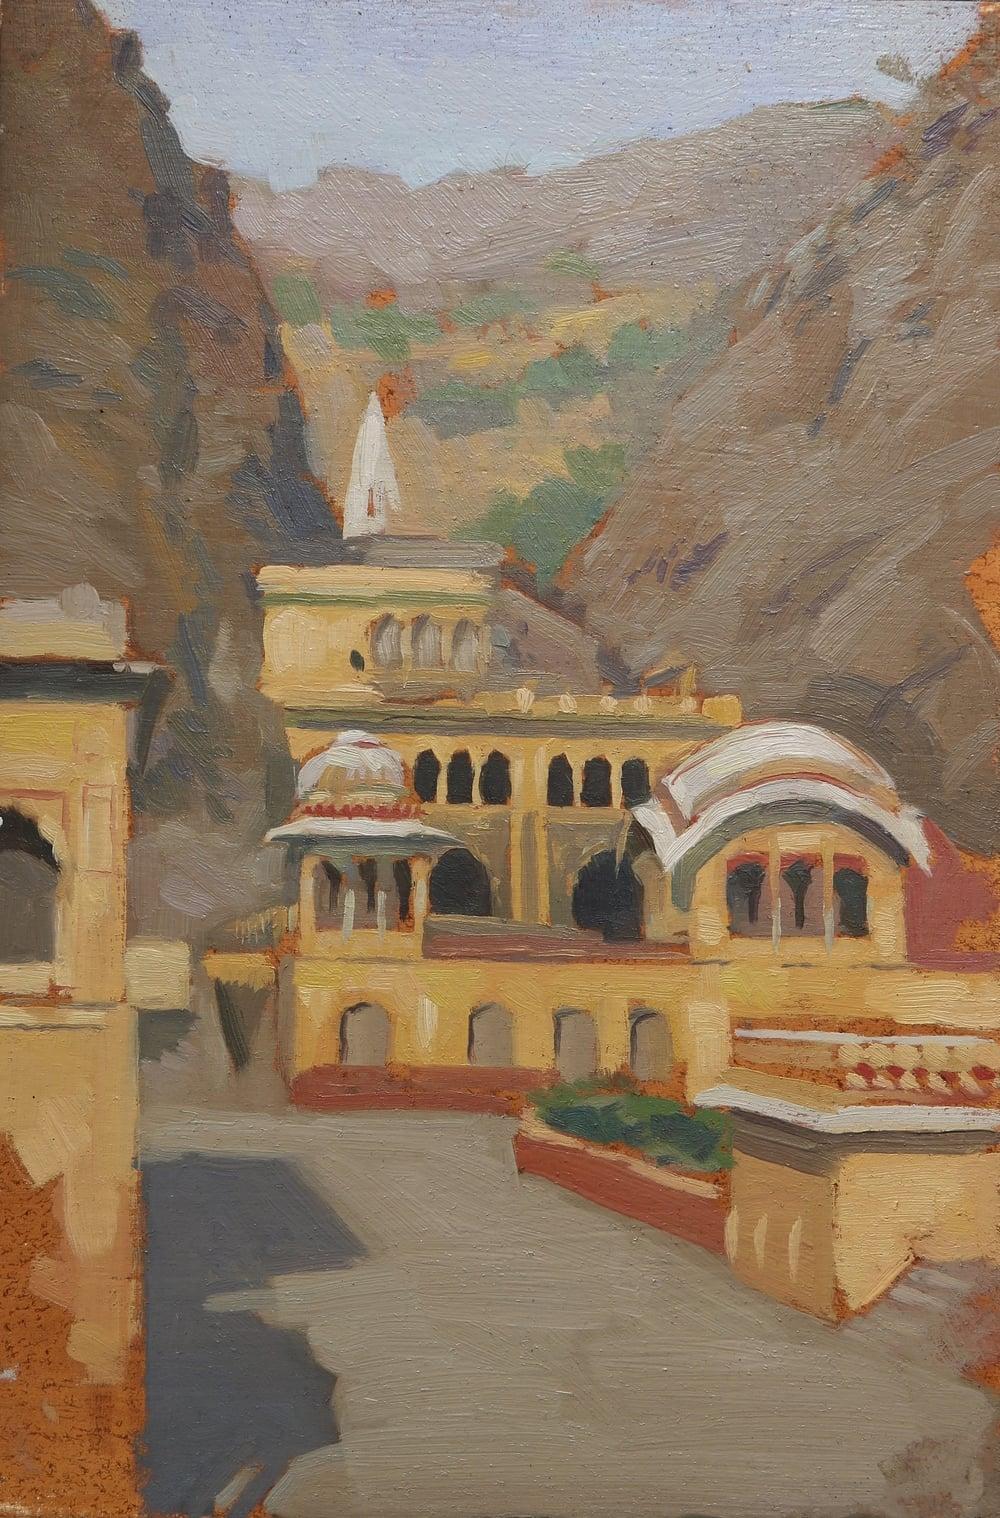 monkey temple, jaipur, 20x30cm, oil on board.jpg